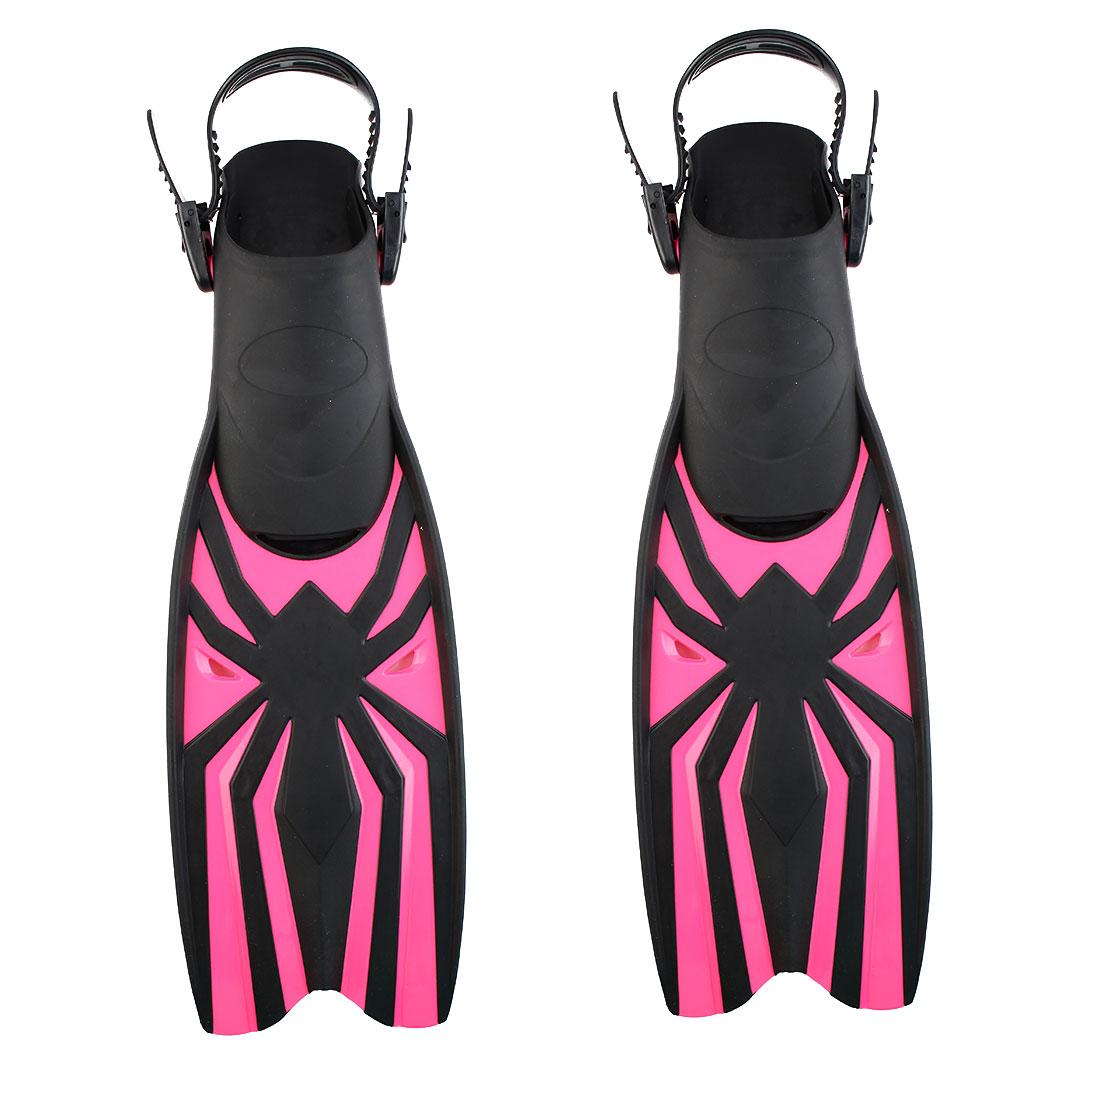 Swim Diving Snorkel Training Adjustable Floating Fin Flipper Fuchsia Size M Pair